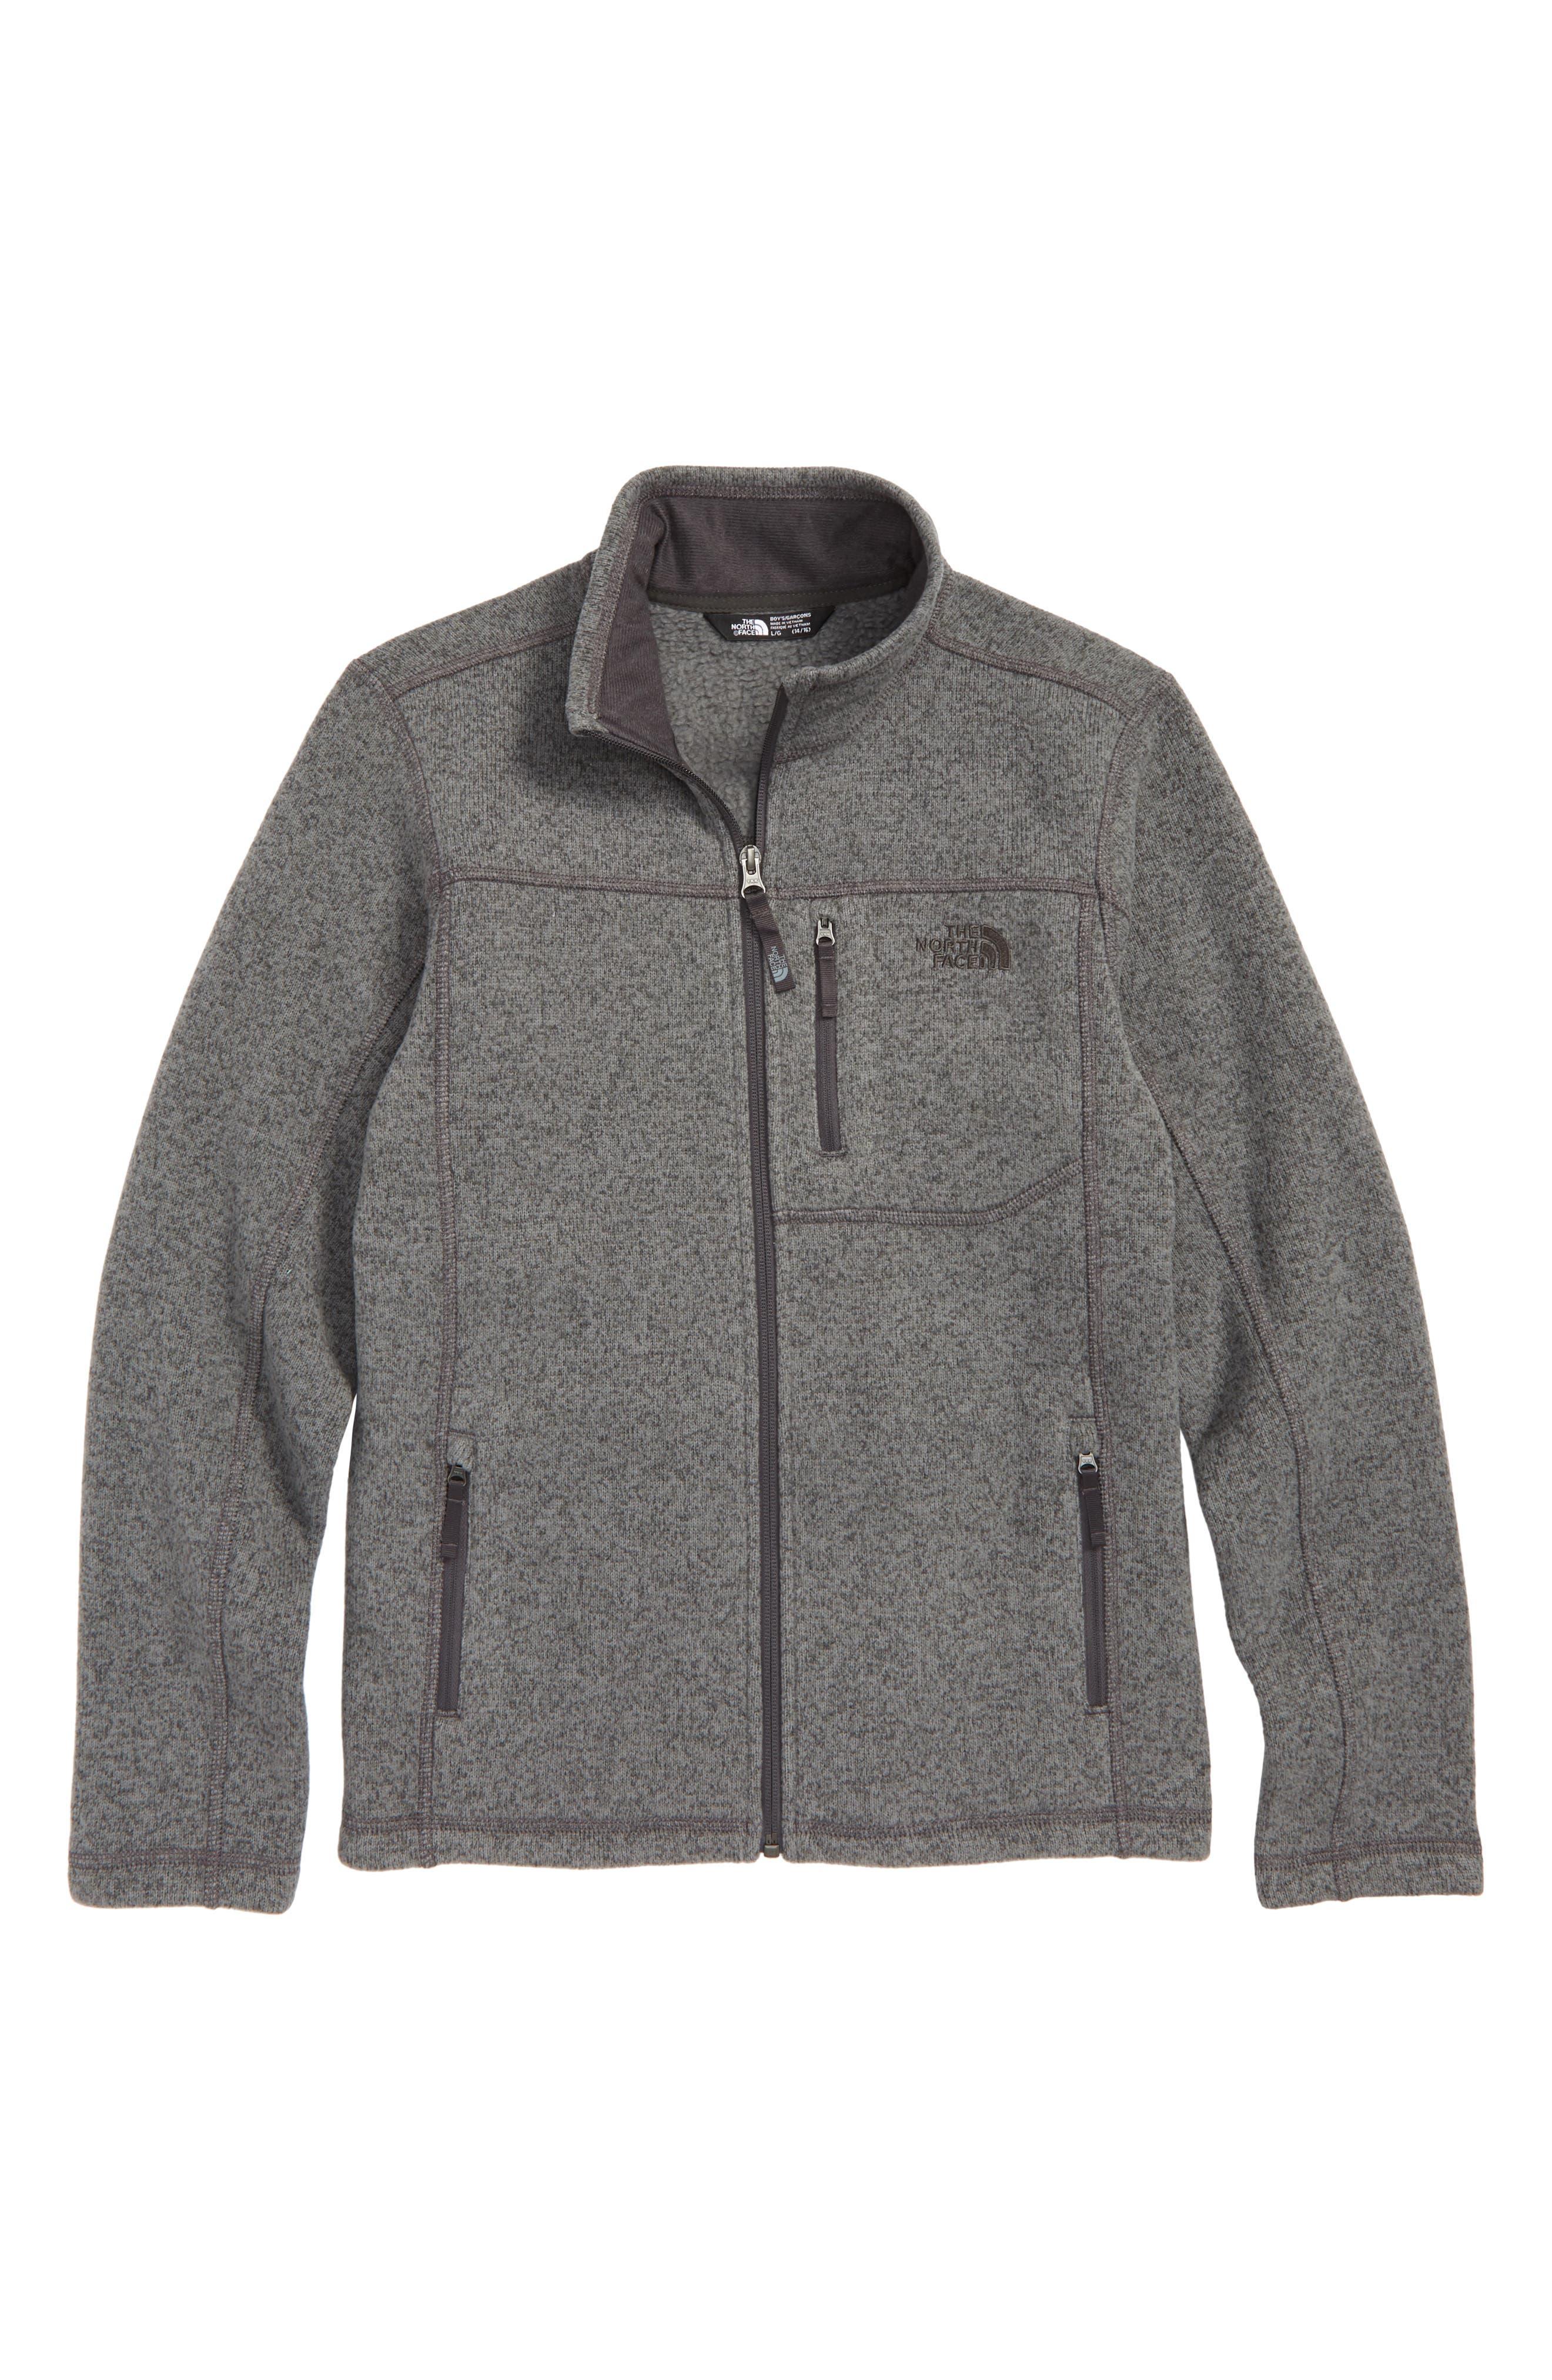 Gordon Lyons Sweater Fleece Zip Jacket,                         Main,                         color, GRAPHITE HEATHER GREY